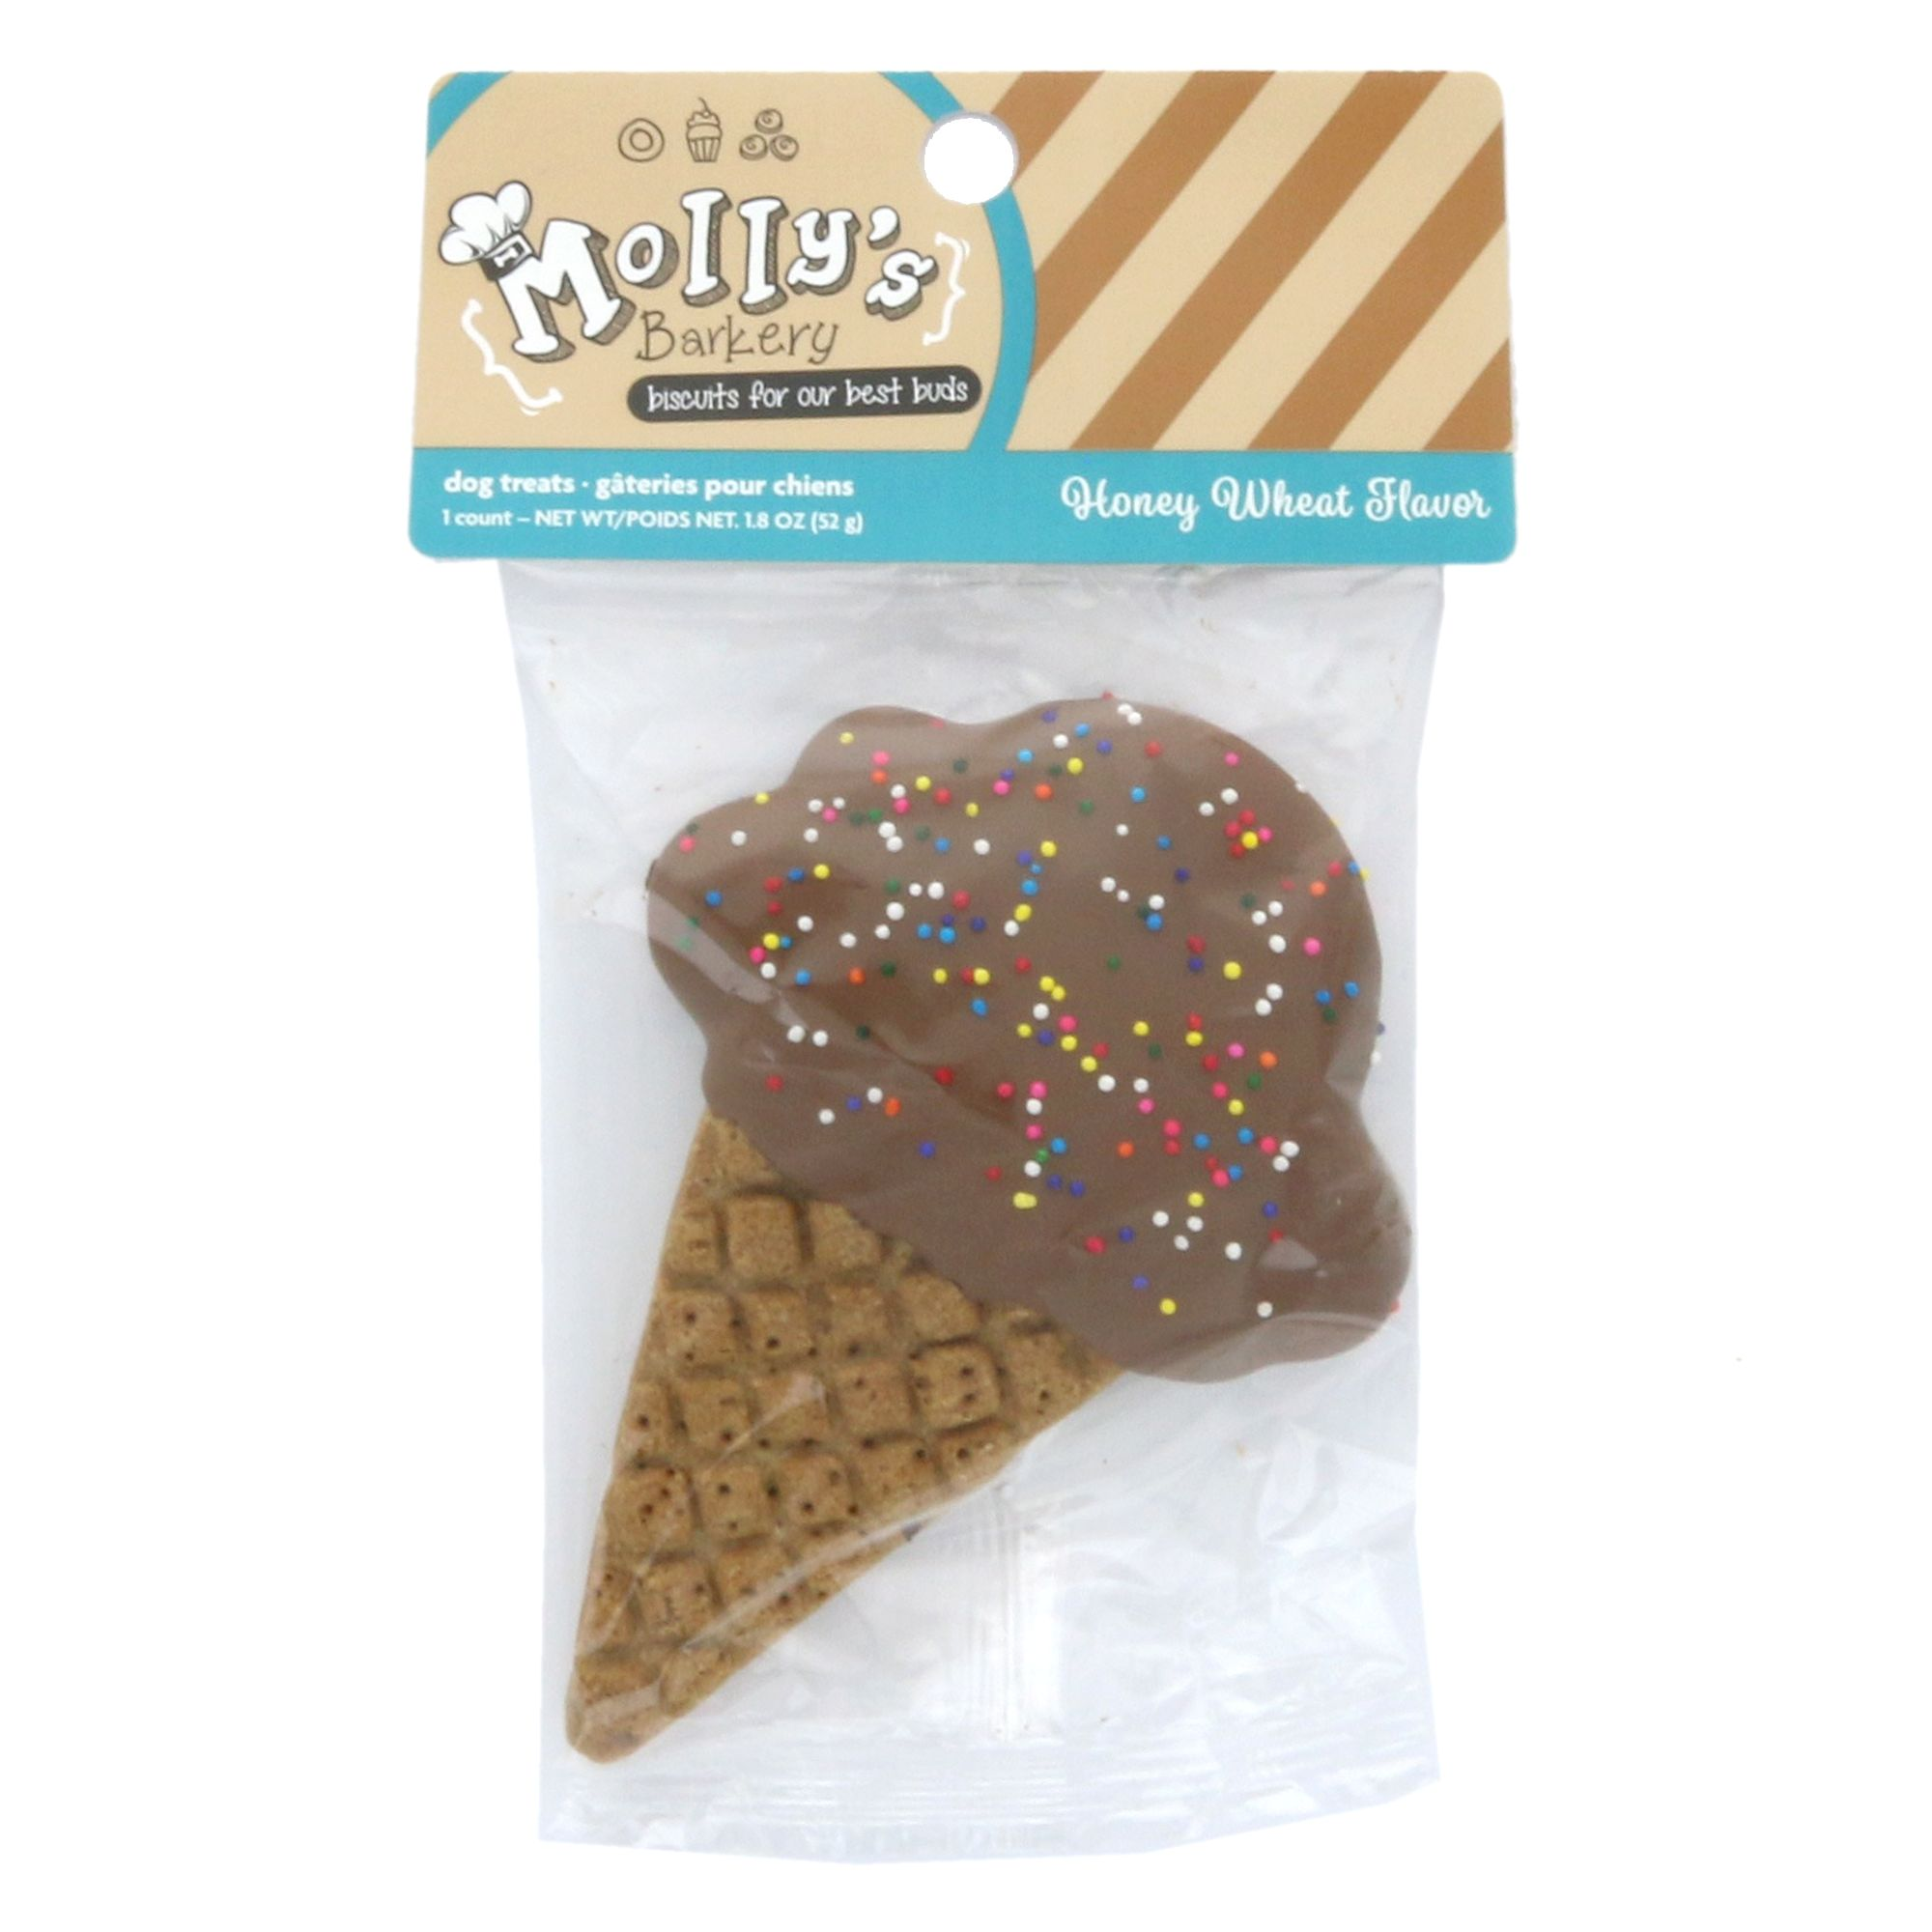 Mollys Barkery Ice Cream Cone Cookie Dog Treat Honey Wheat